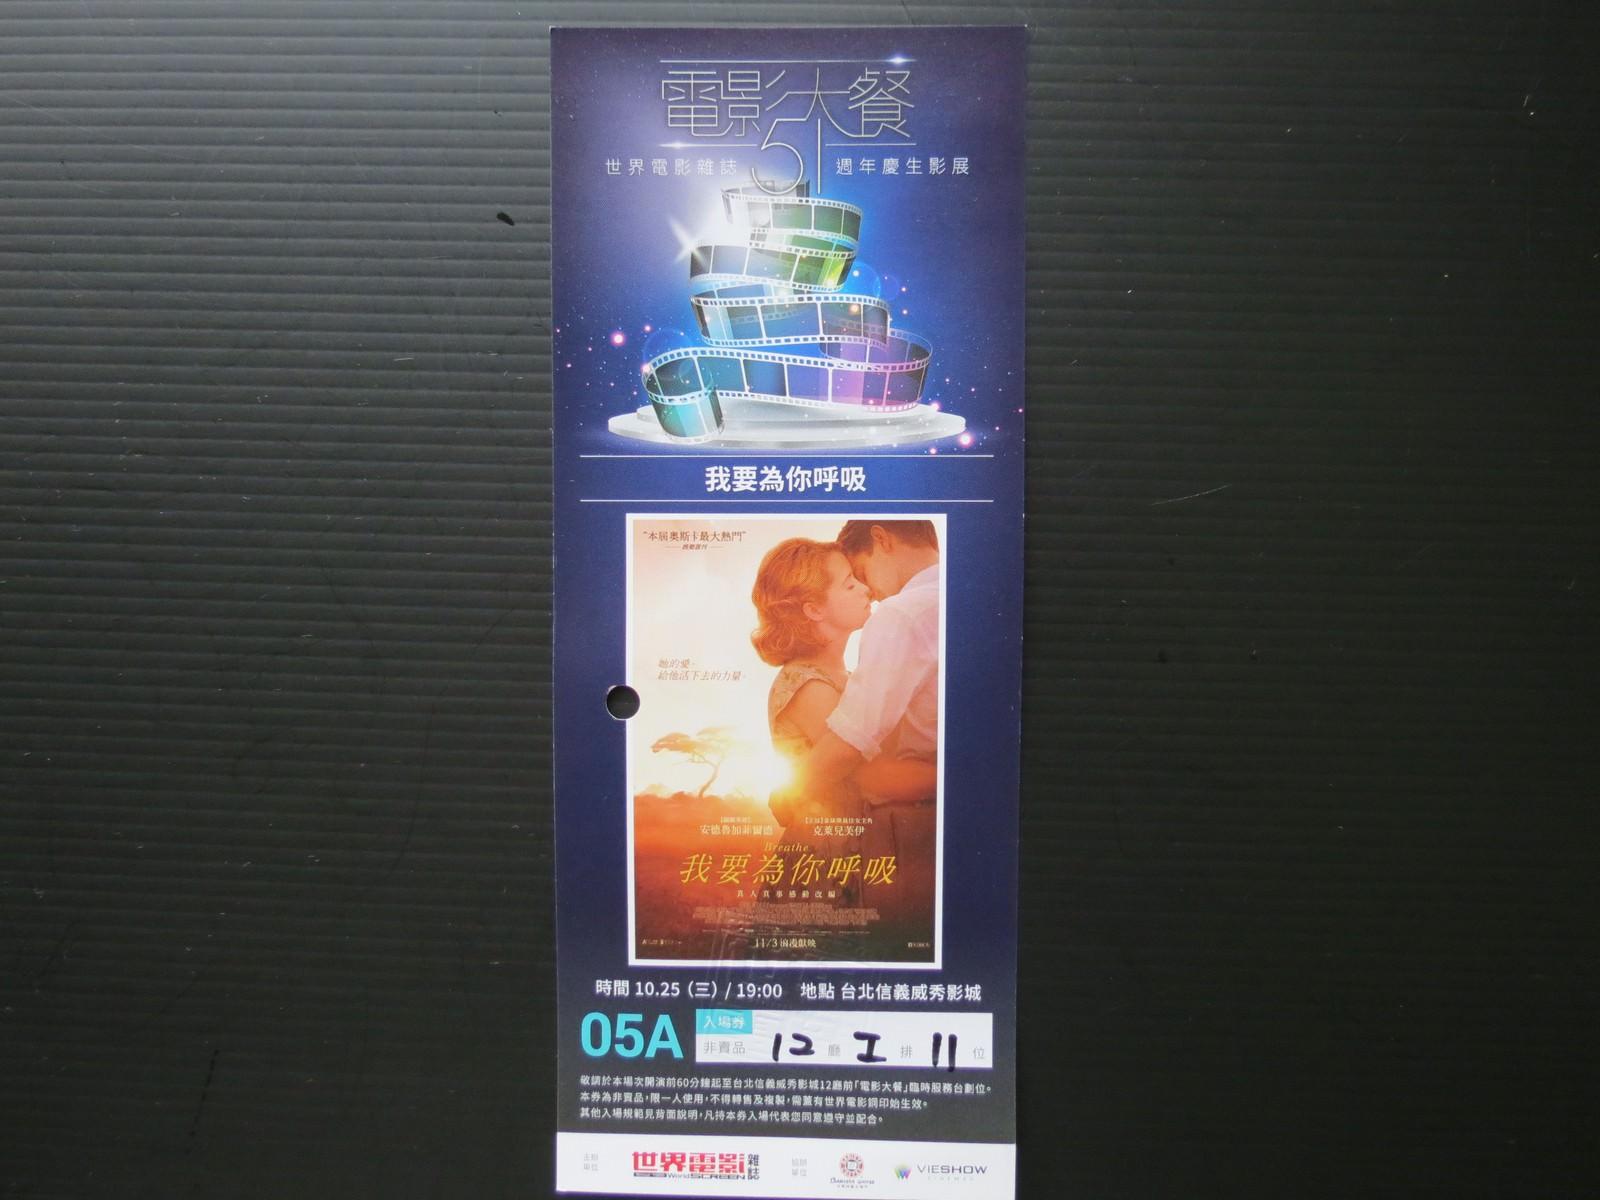 Movie, Breathe(英國, 2017年) / 我要為你呼吸(台灣) / 一呼一吸(網路), 電影海報, 特映會邀請卡